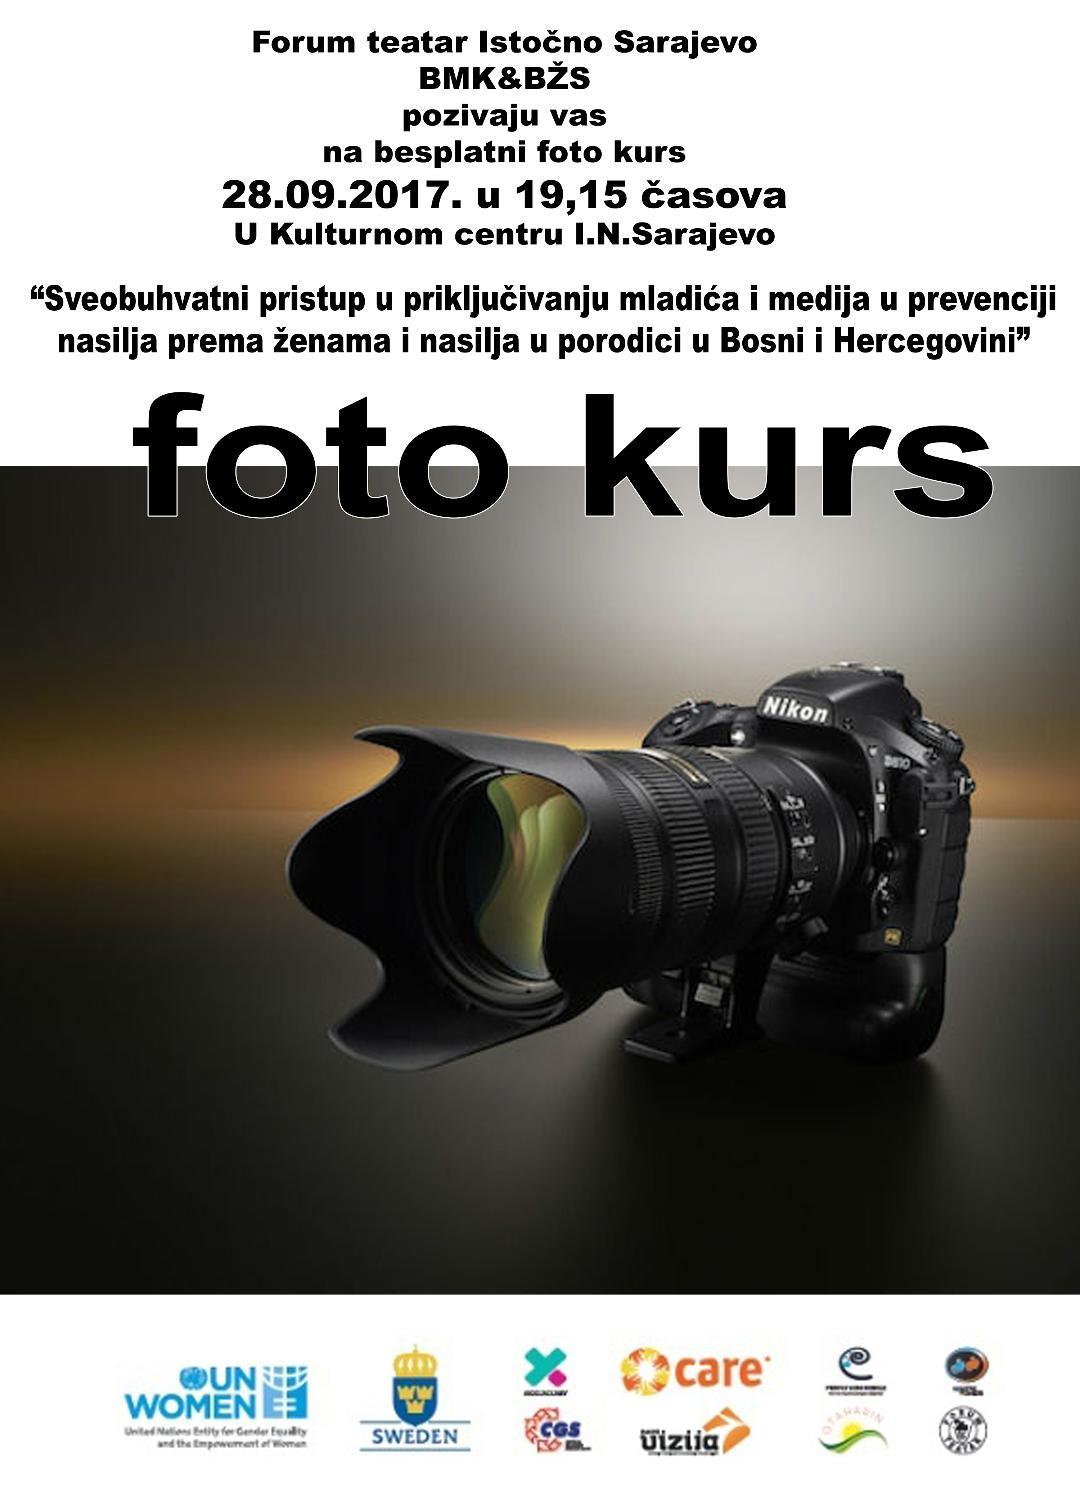 foto kurs poster